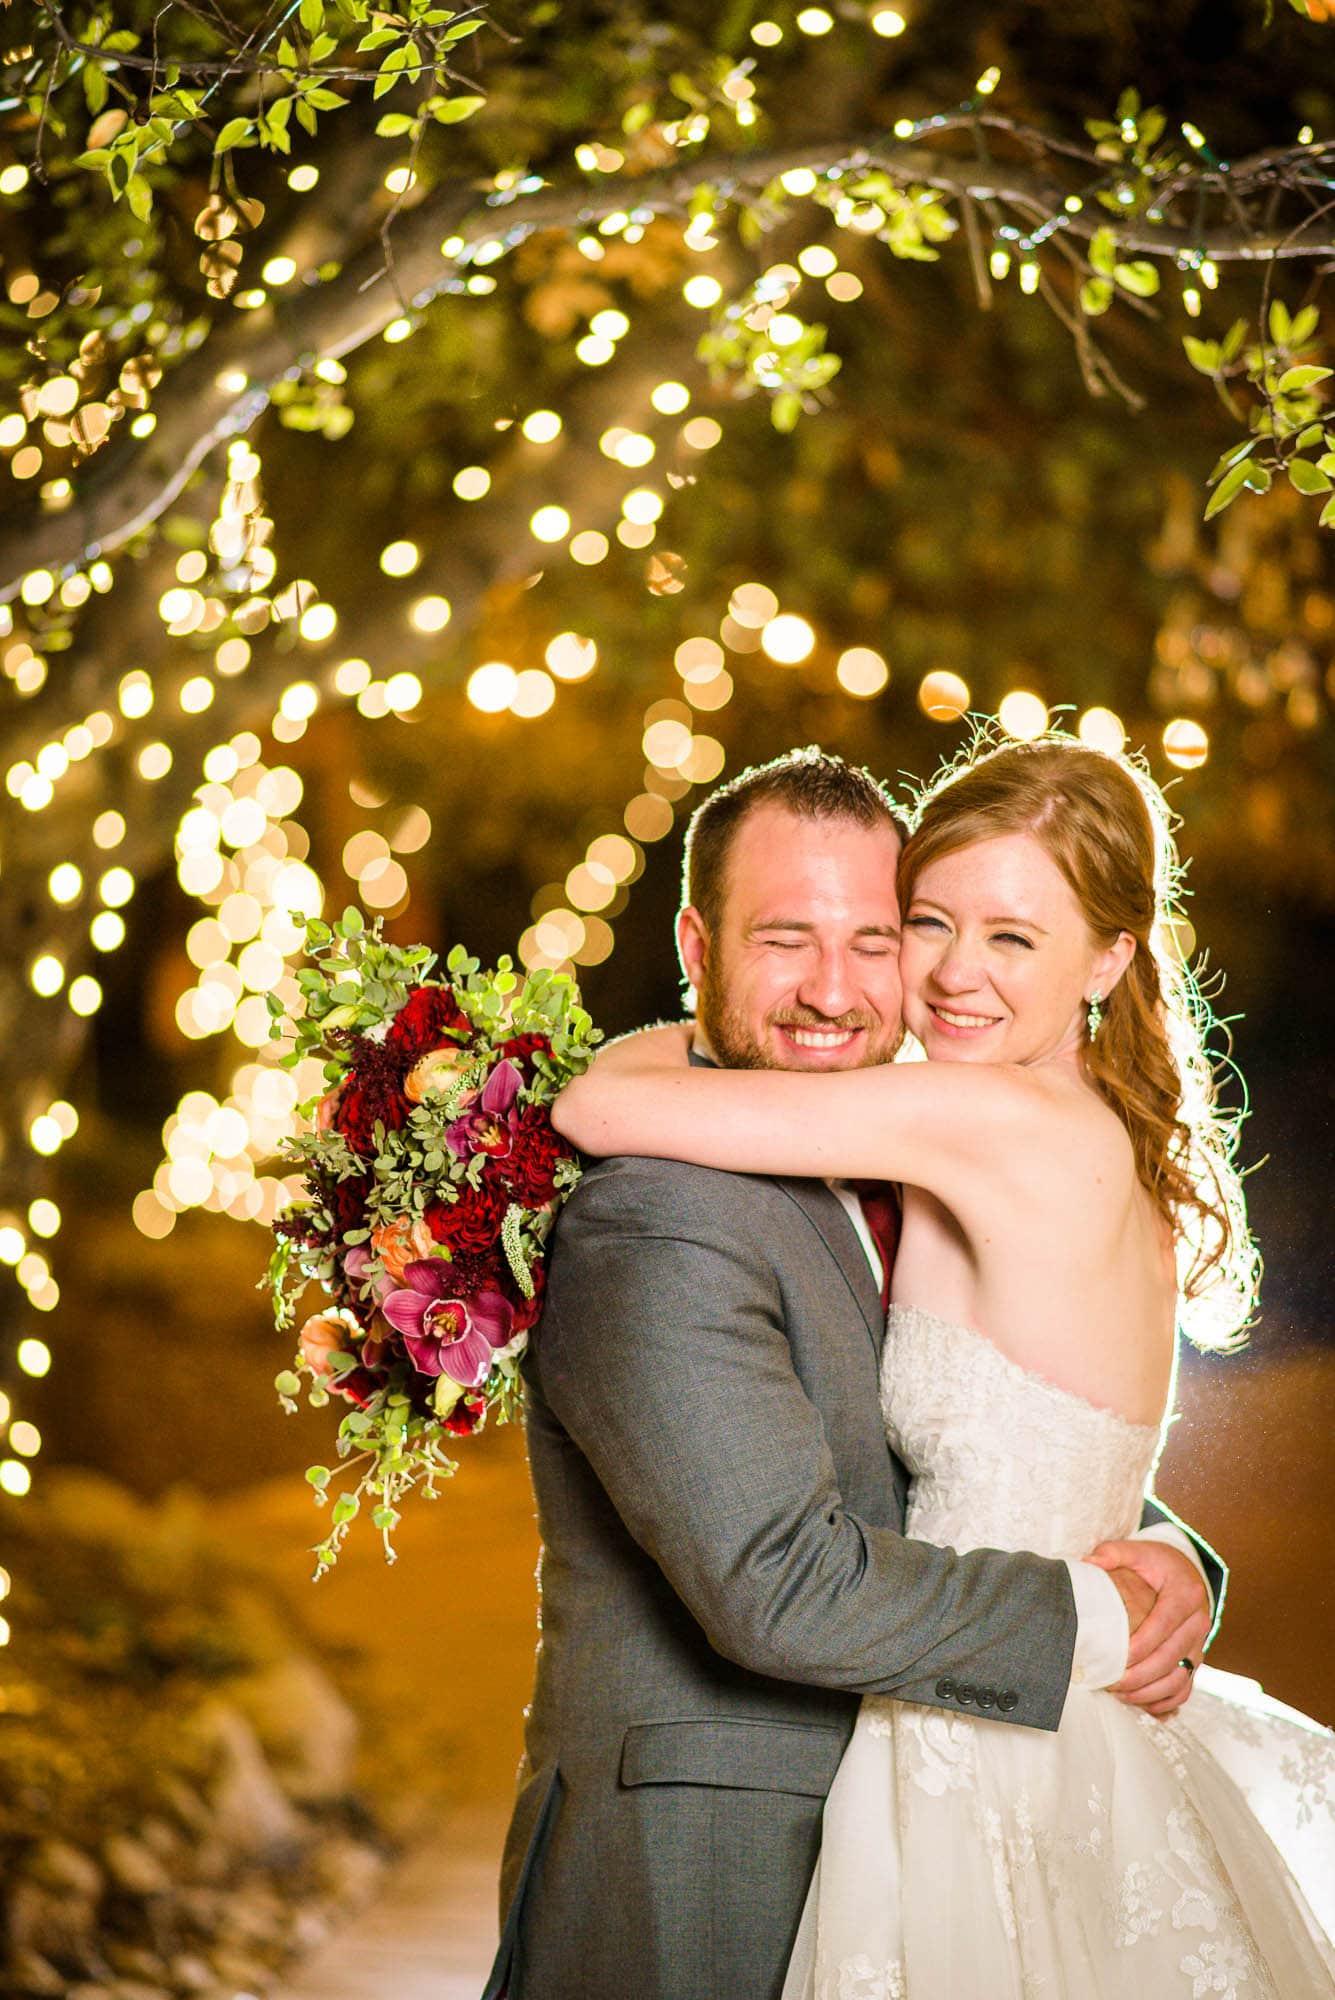 735_Alan_and_Heidi_Serendipity_Garden_Wedding_10-27-2018